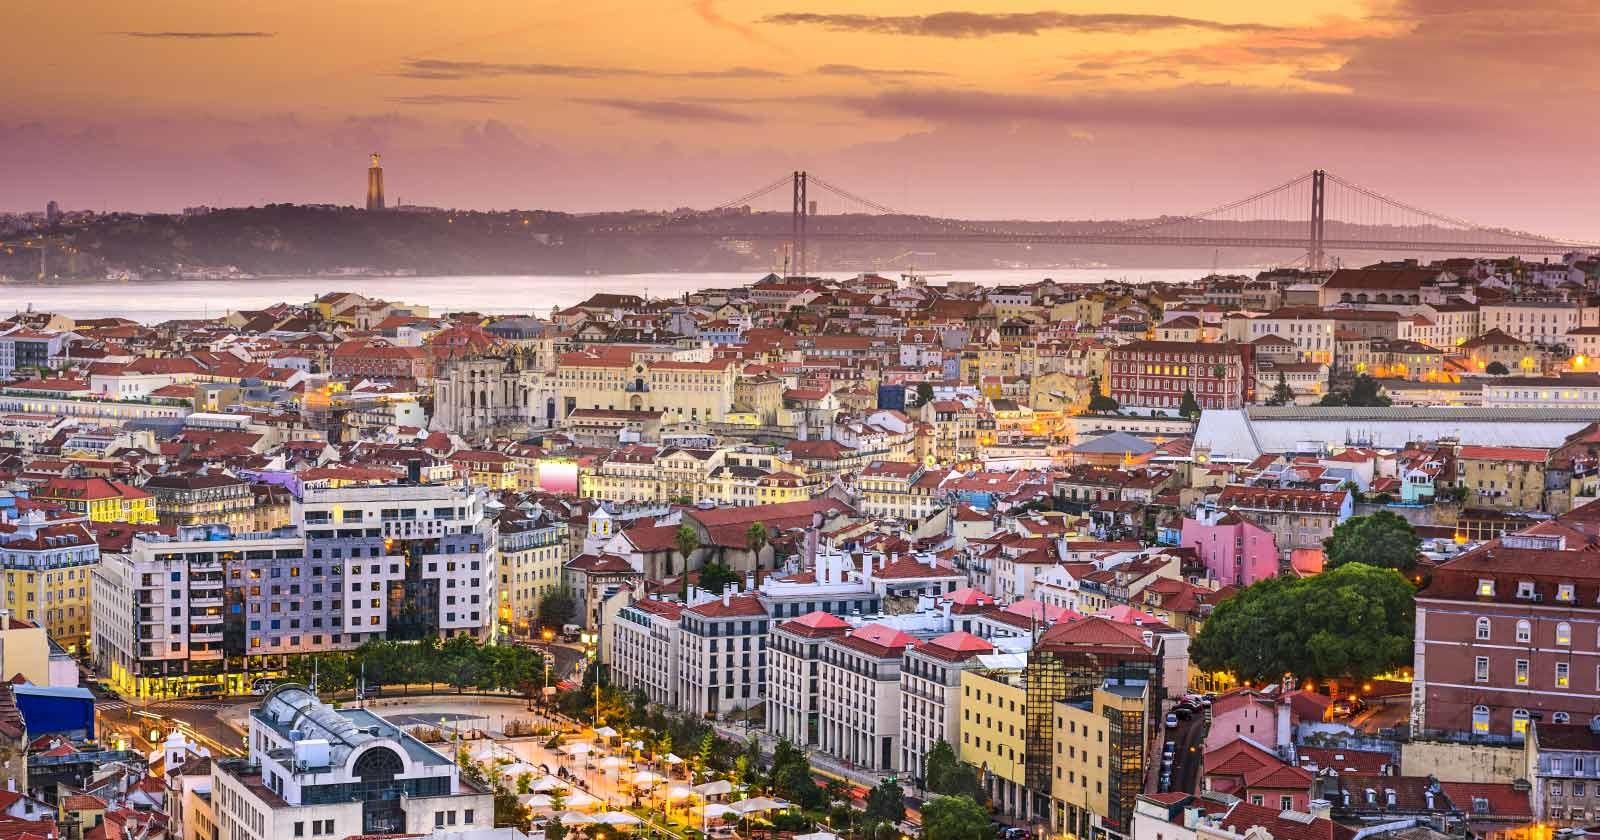 Ufficio Erasmus Architettura : Lisbon erasmus story esperienza erasmus lisbona